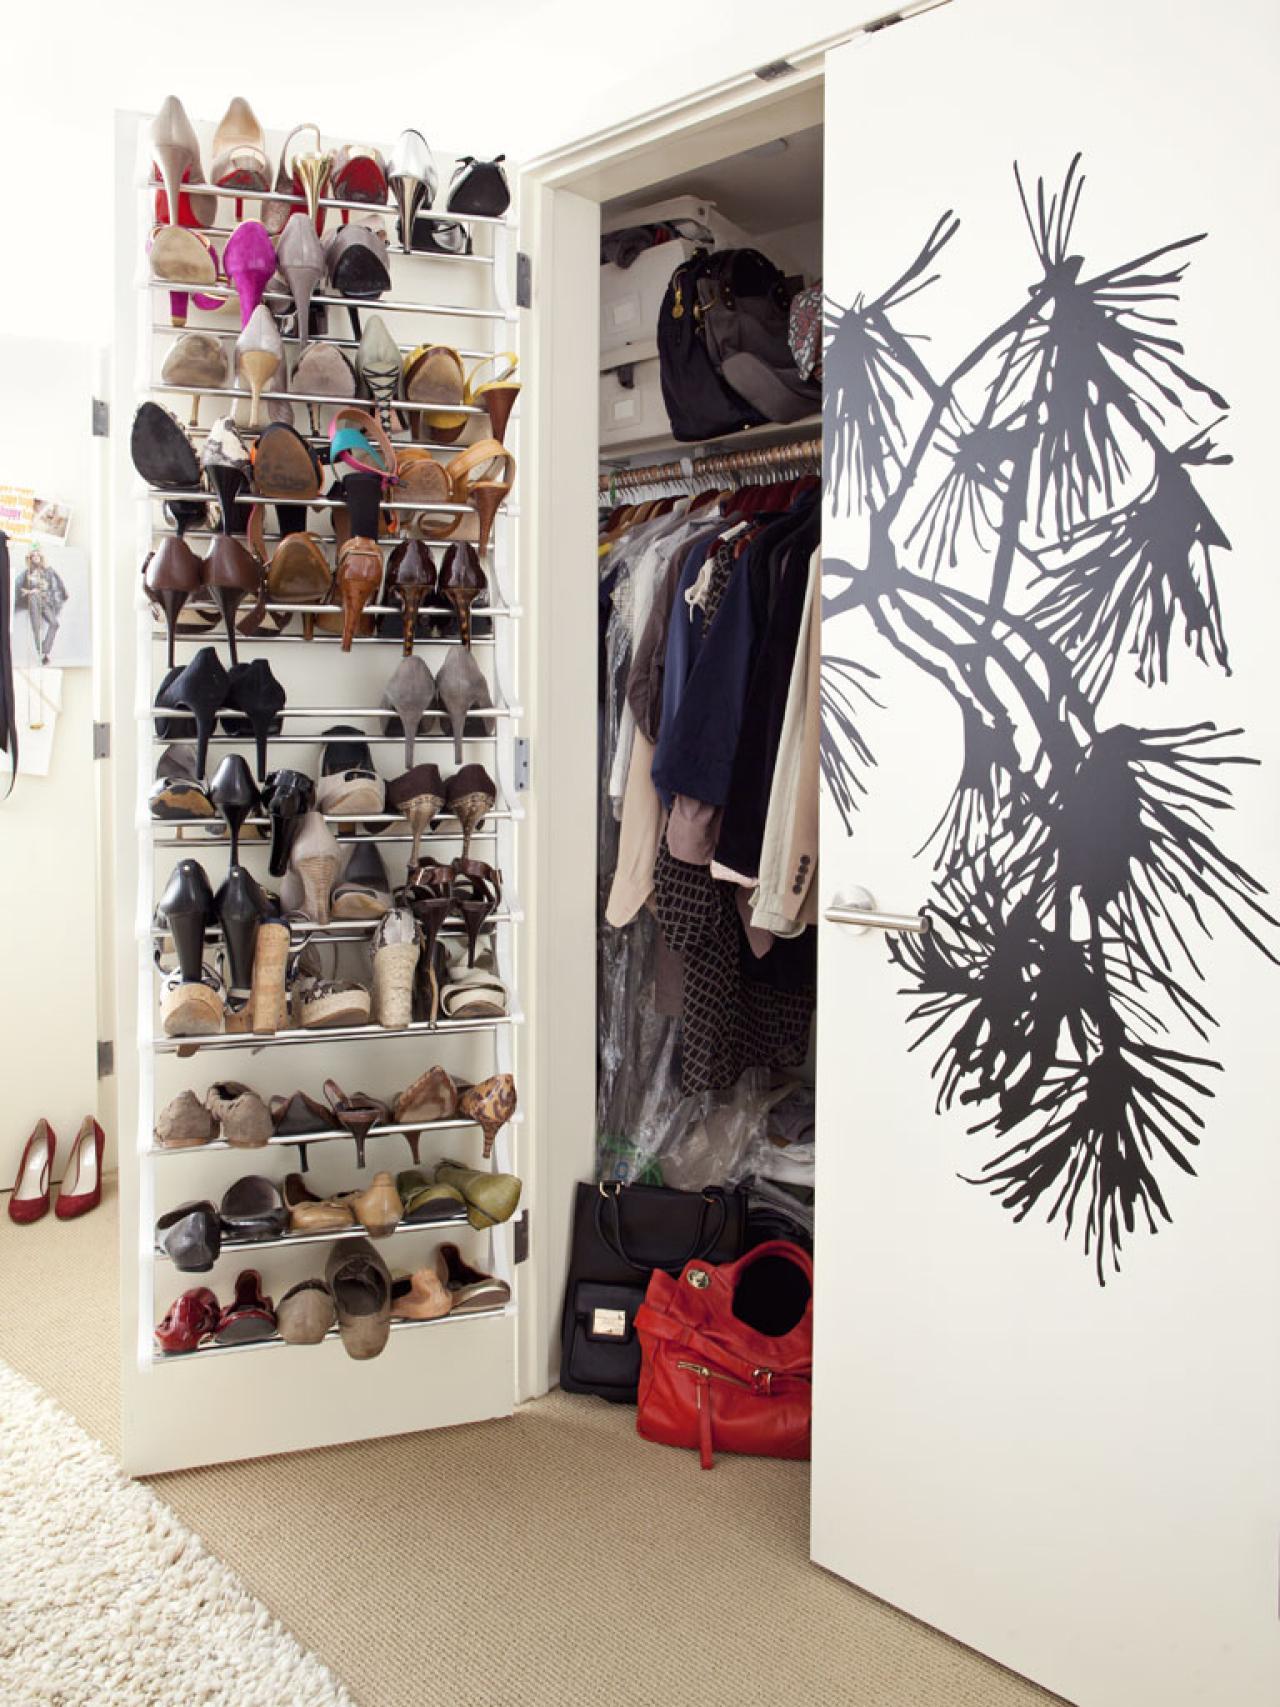 polliwogspondcom shoes on doors Dorm room